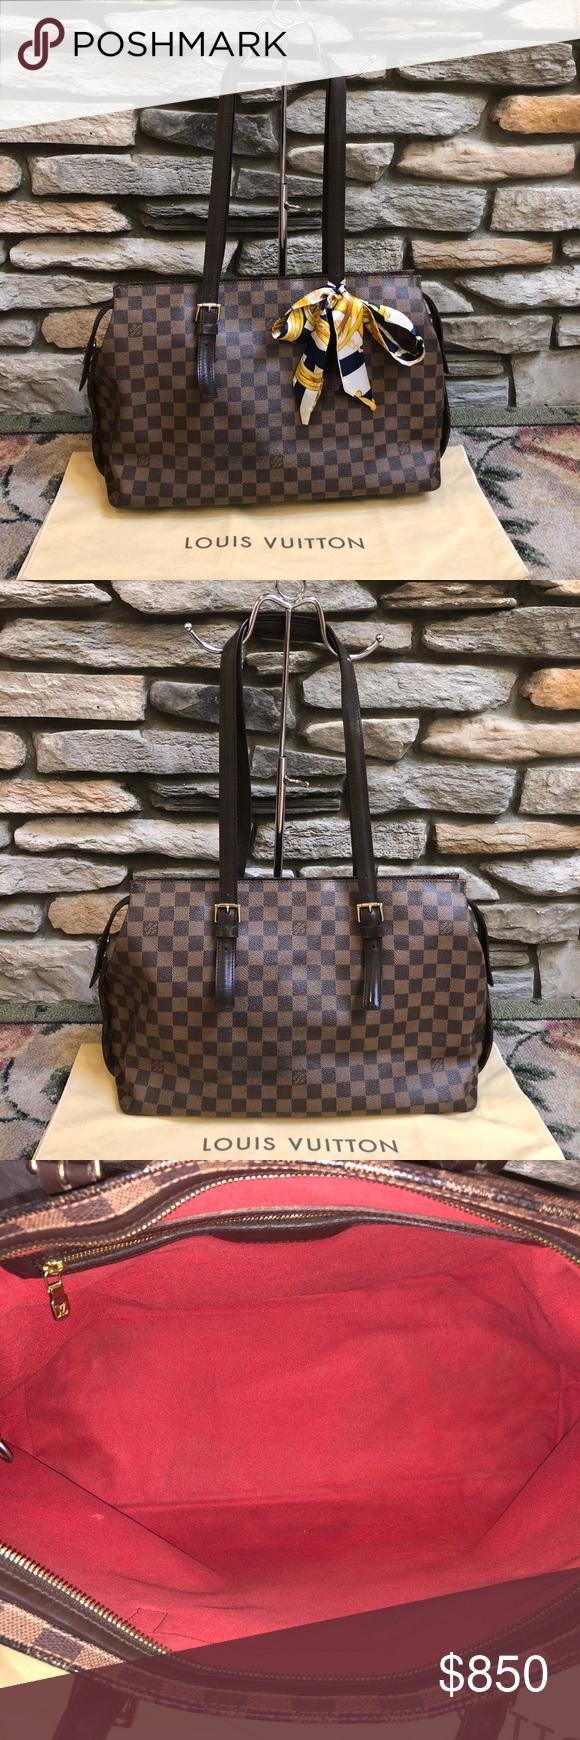 5675eb4c22296 Louis Vuitton Damier Ebene Chelsea Tote bag